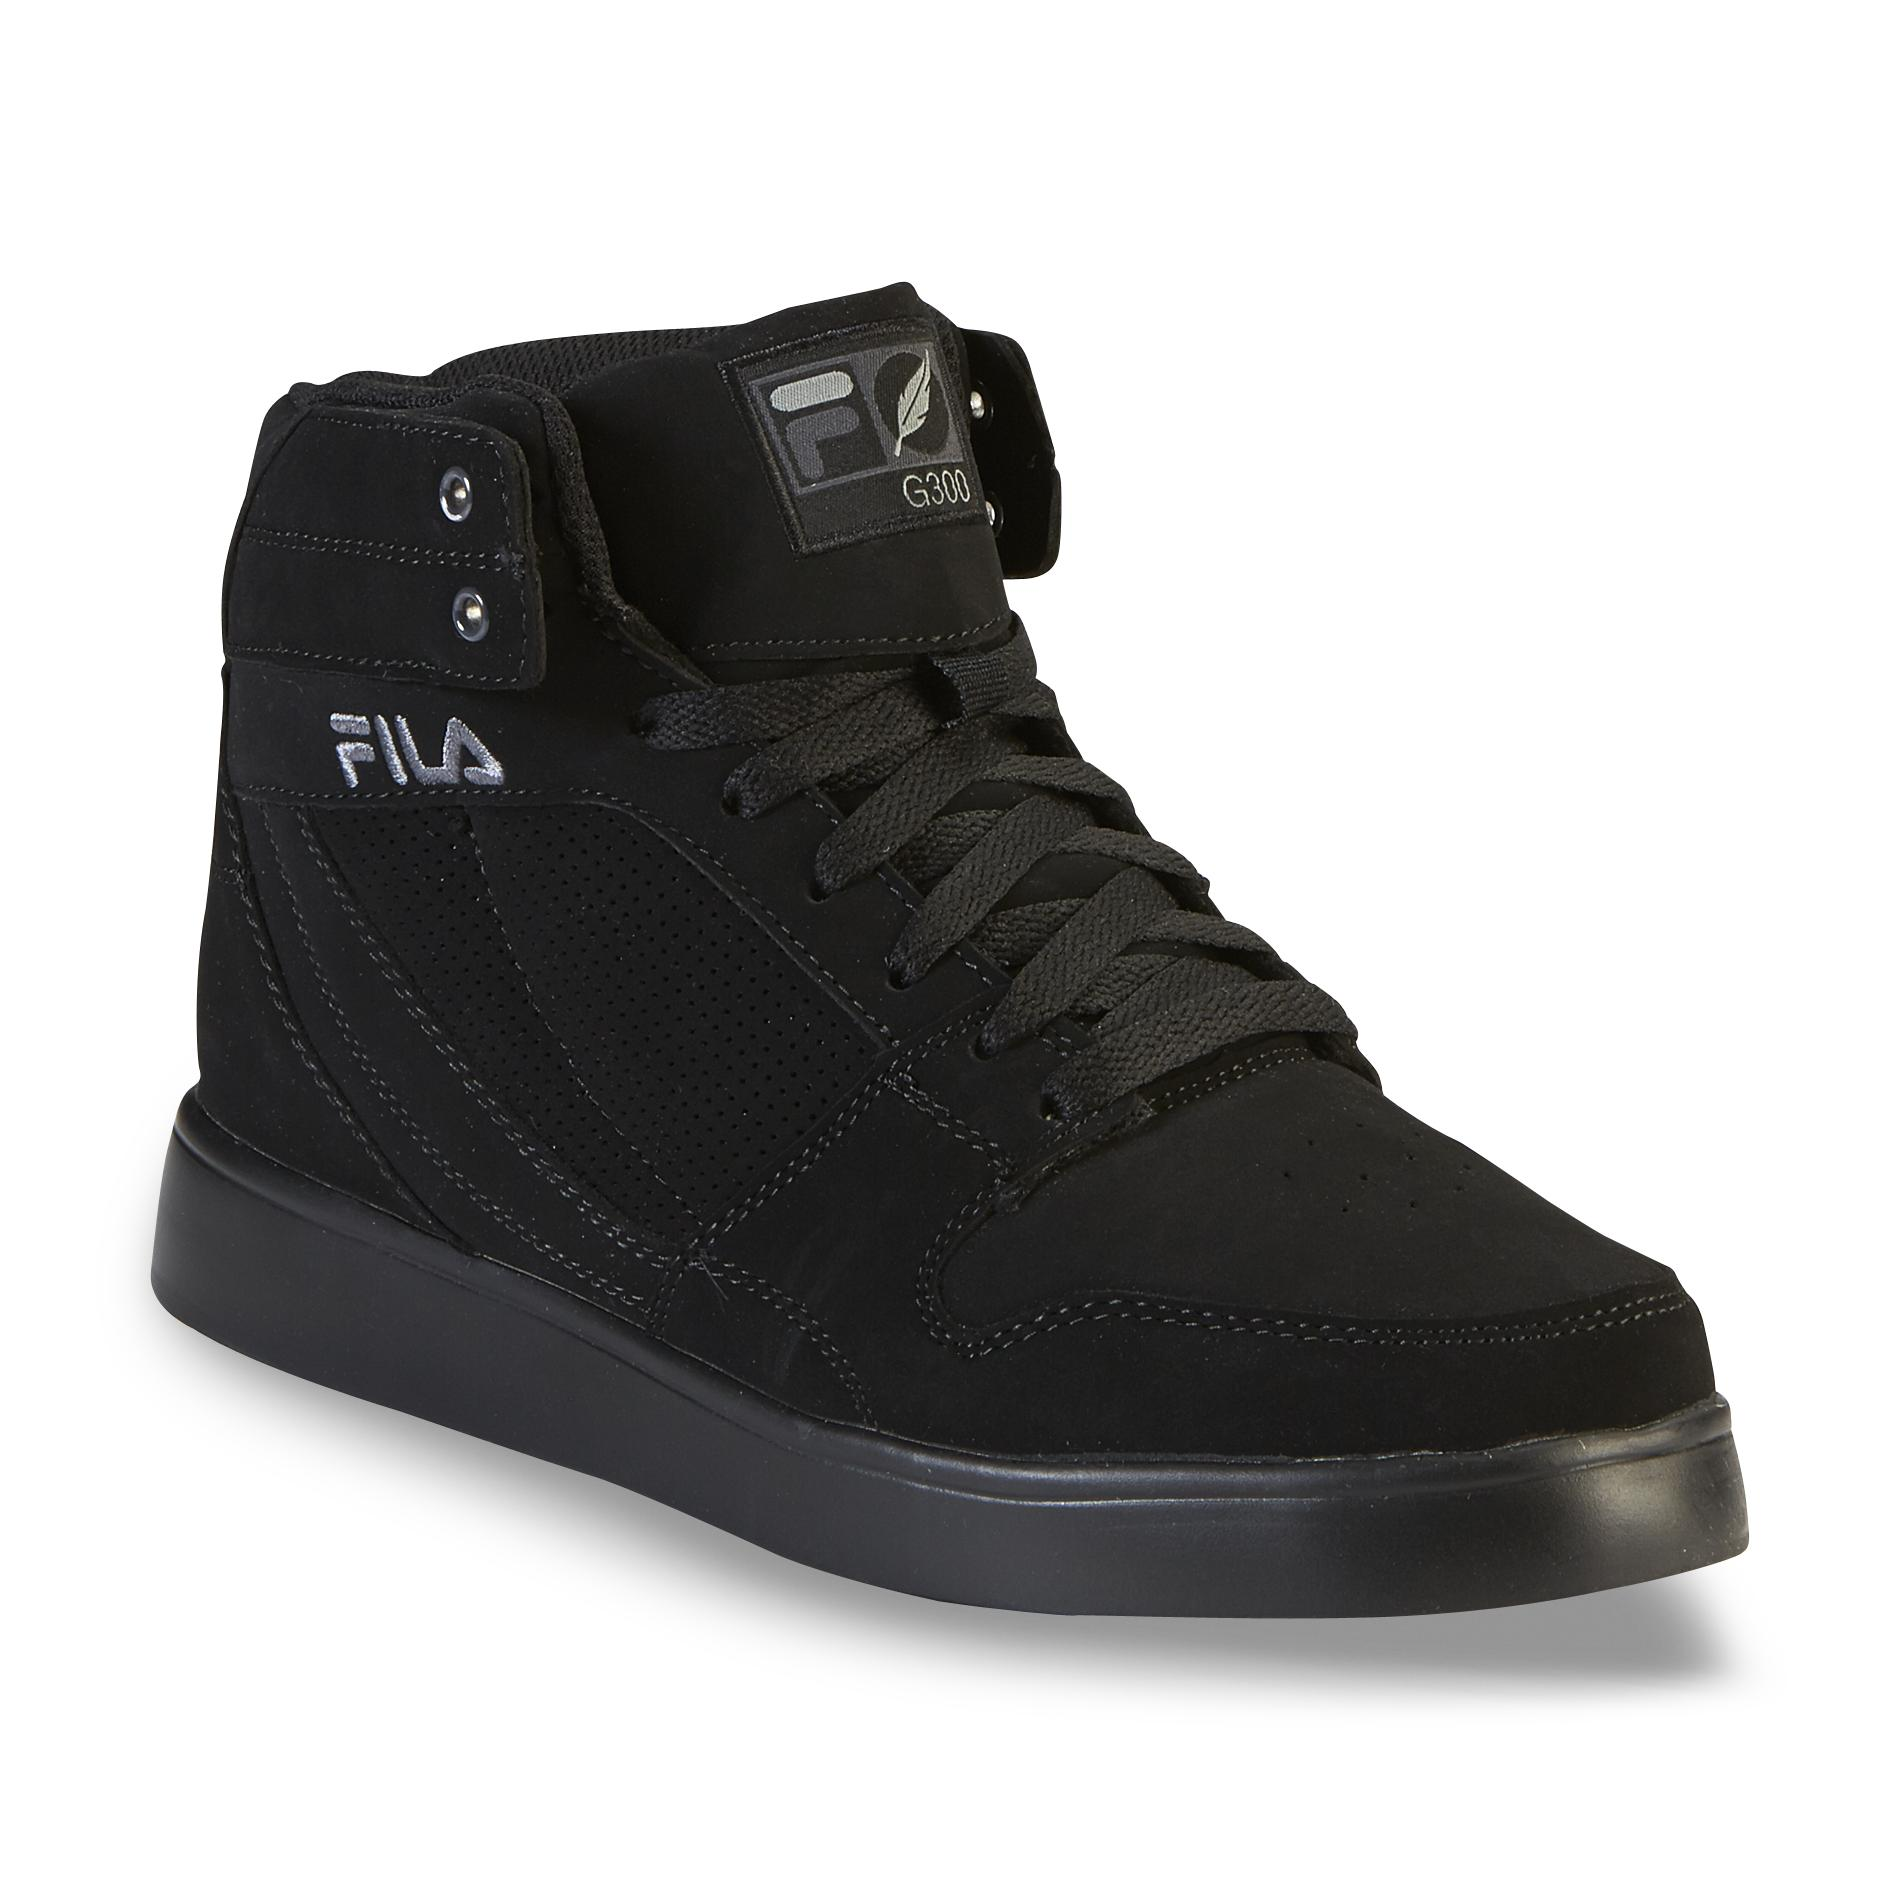 Fila Men S G300 Figueroa Black High Top Shoe Clothing